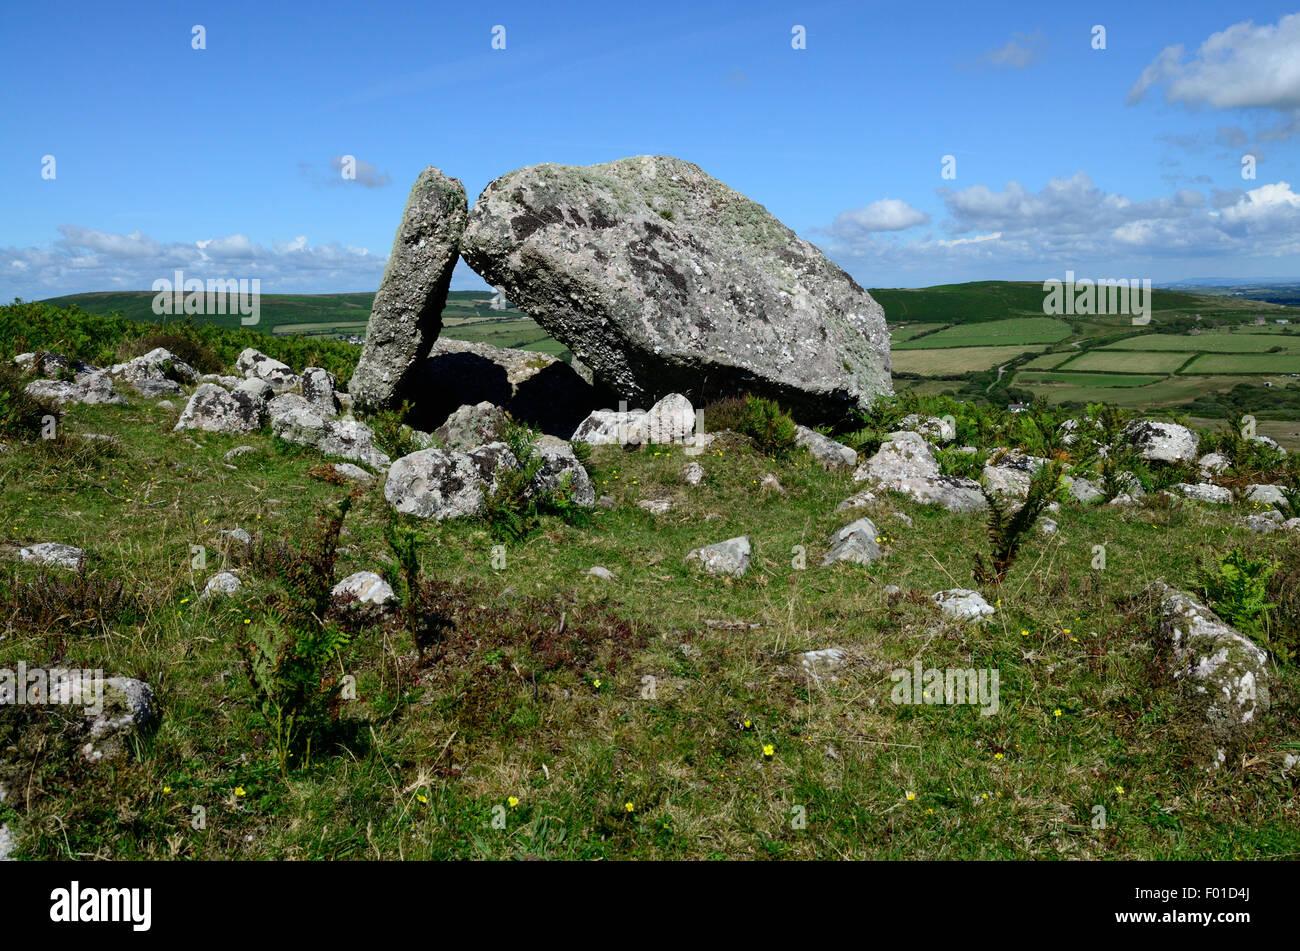 Sweynes Howes chambered tomb on Rhossili Down Gower peninsula Glamorgan Wales Cymru K GB - Stock Image